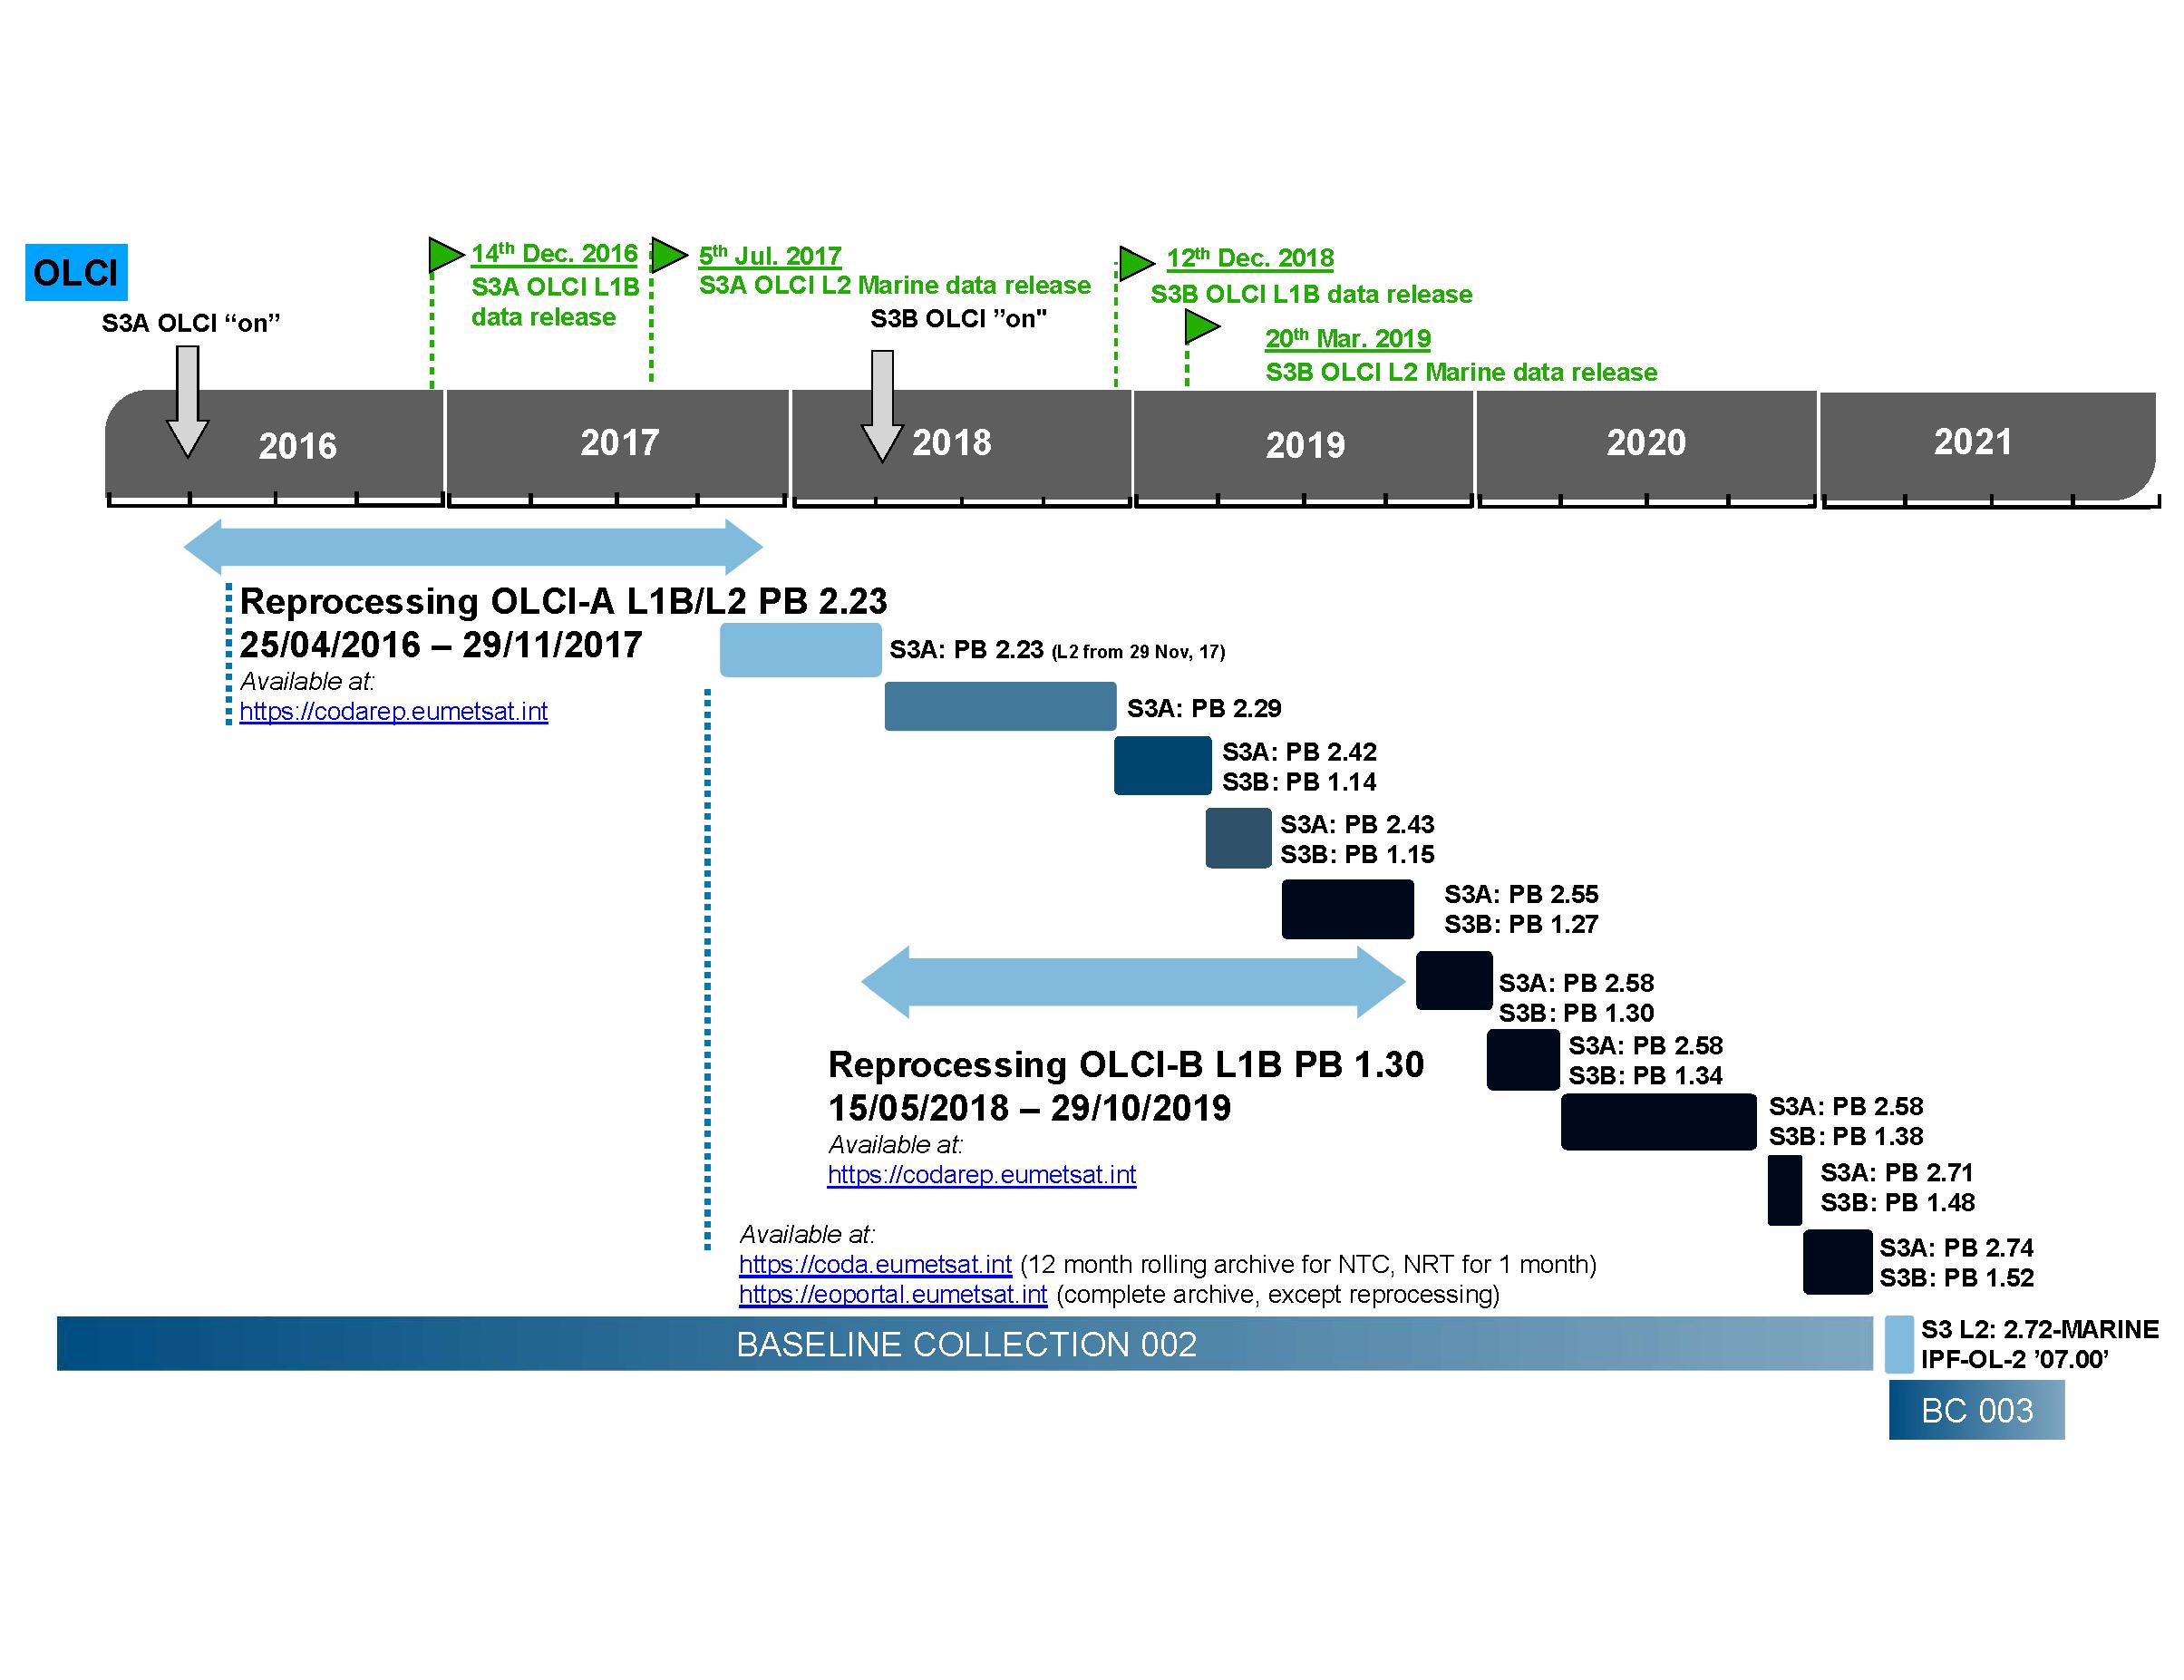 Sentinel-3 Ocean Colour Services processing baselines timeline